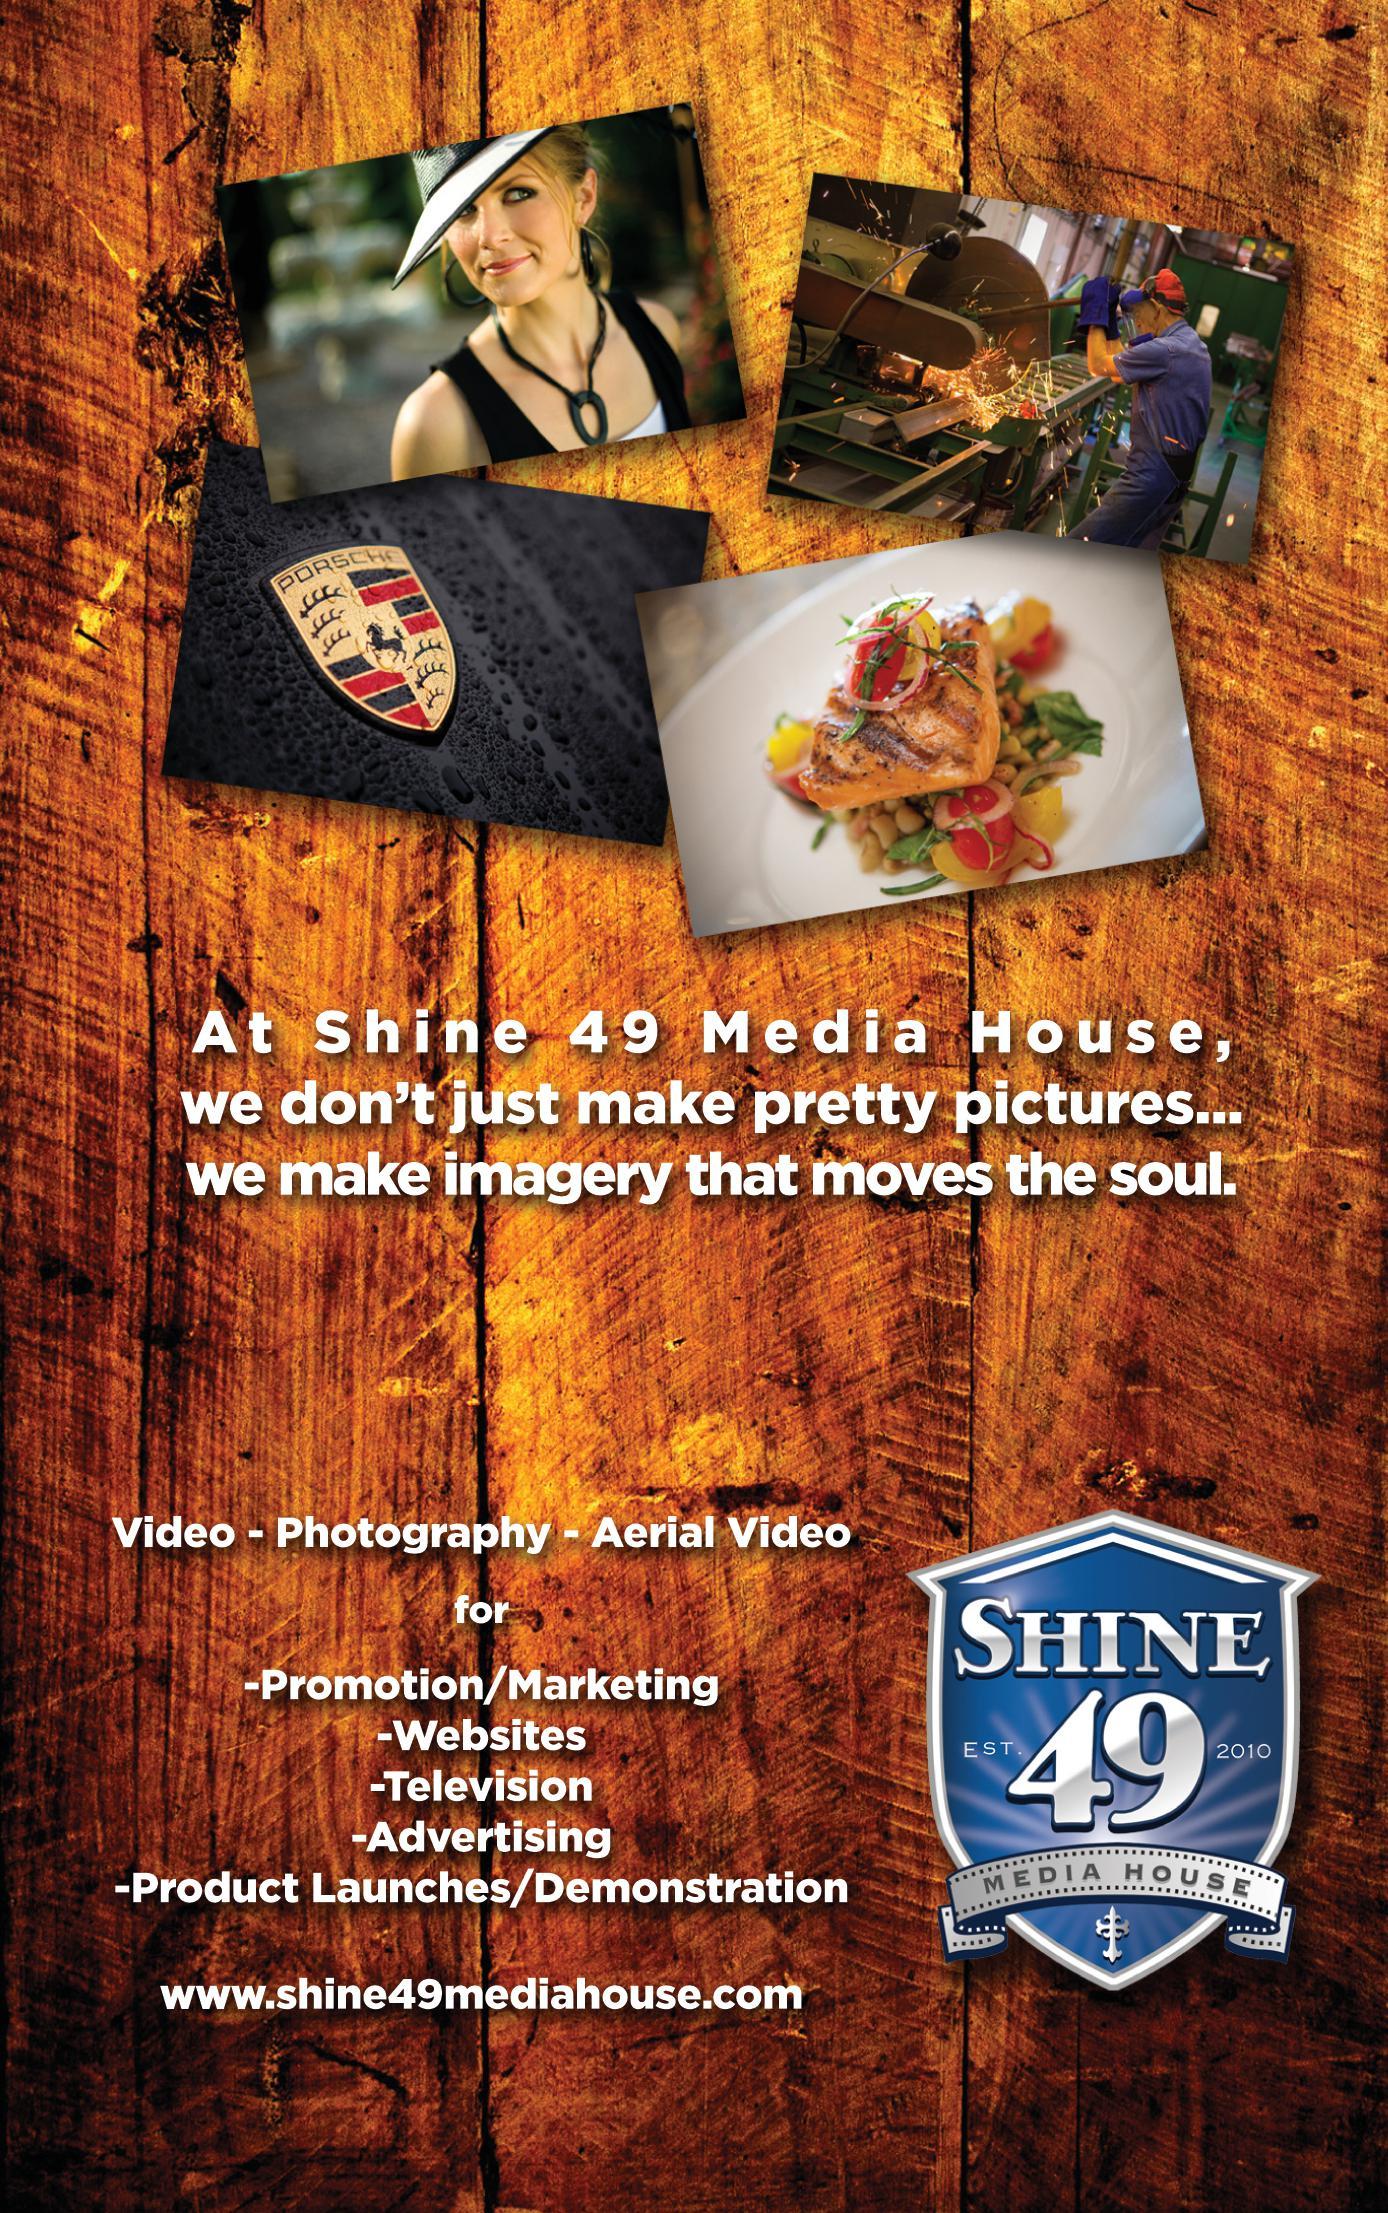 Shine 49 Media House